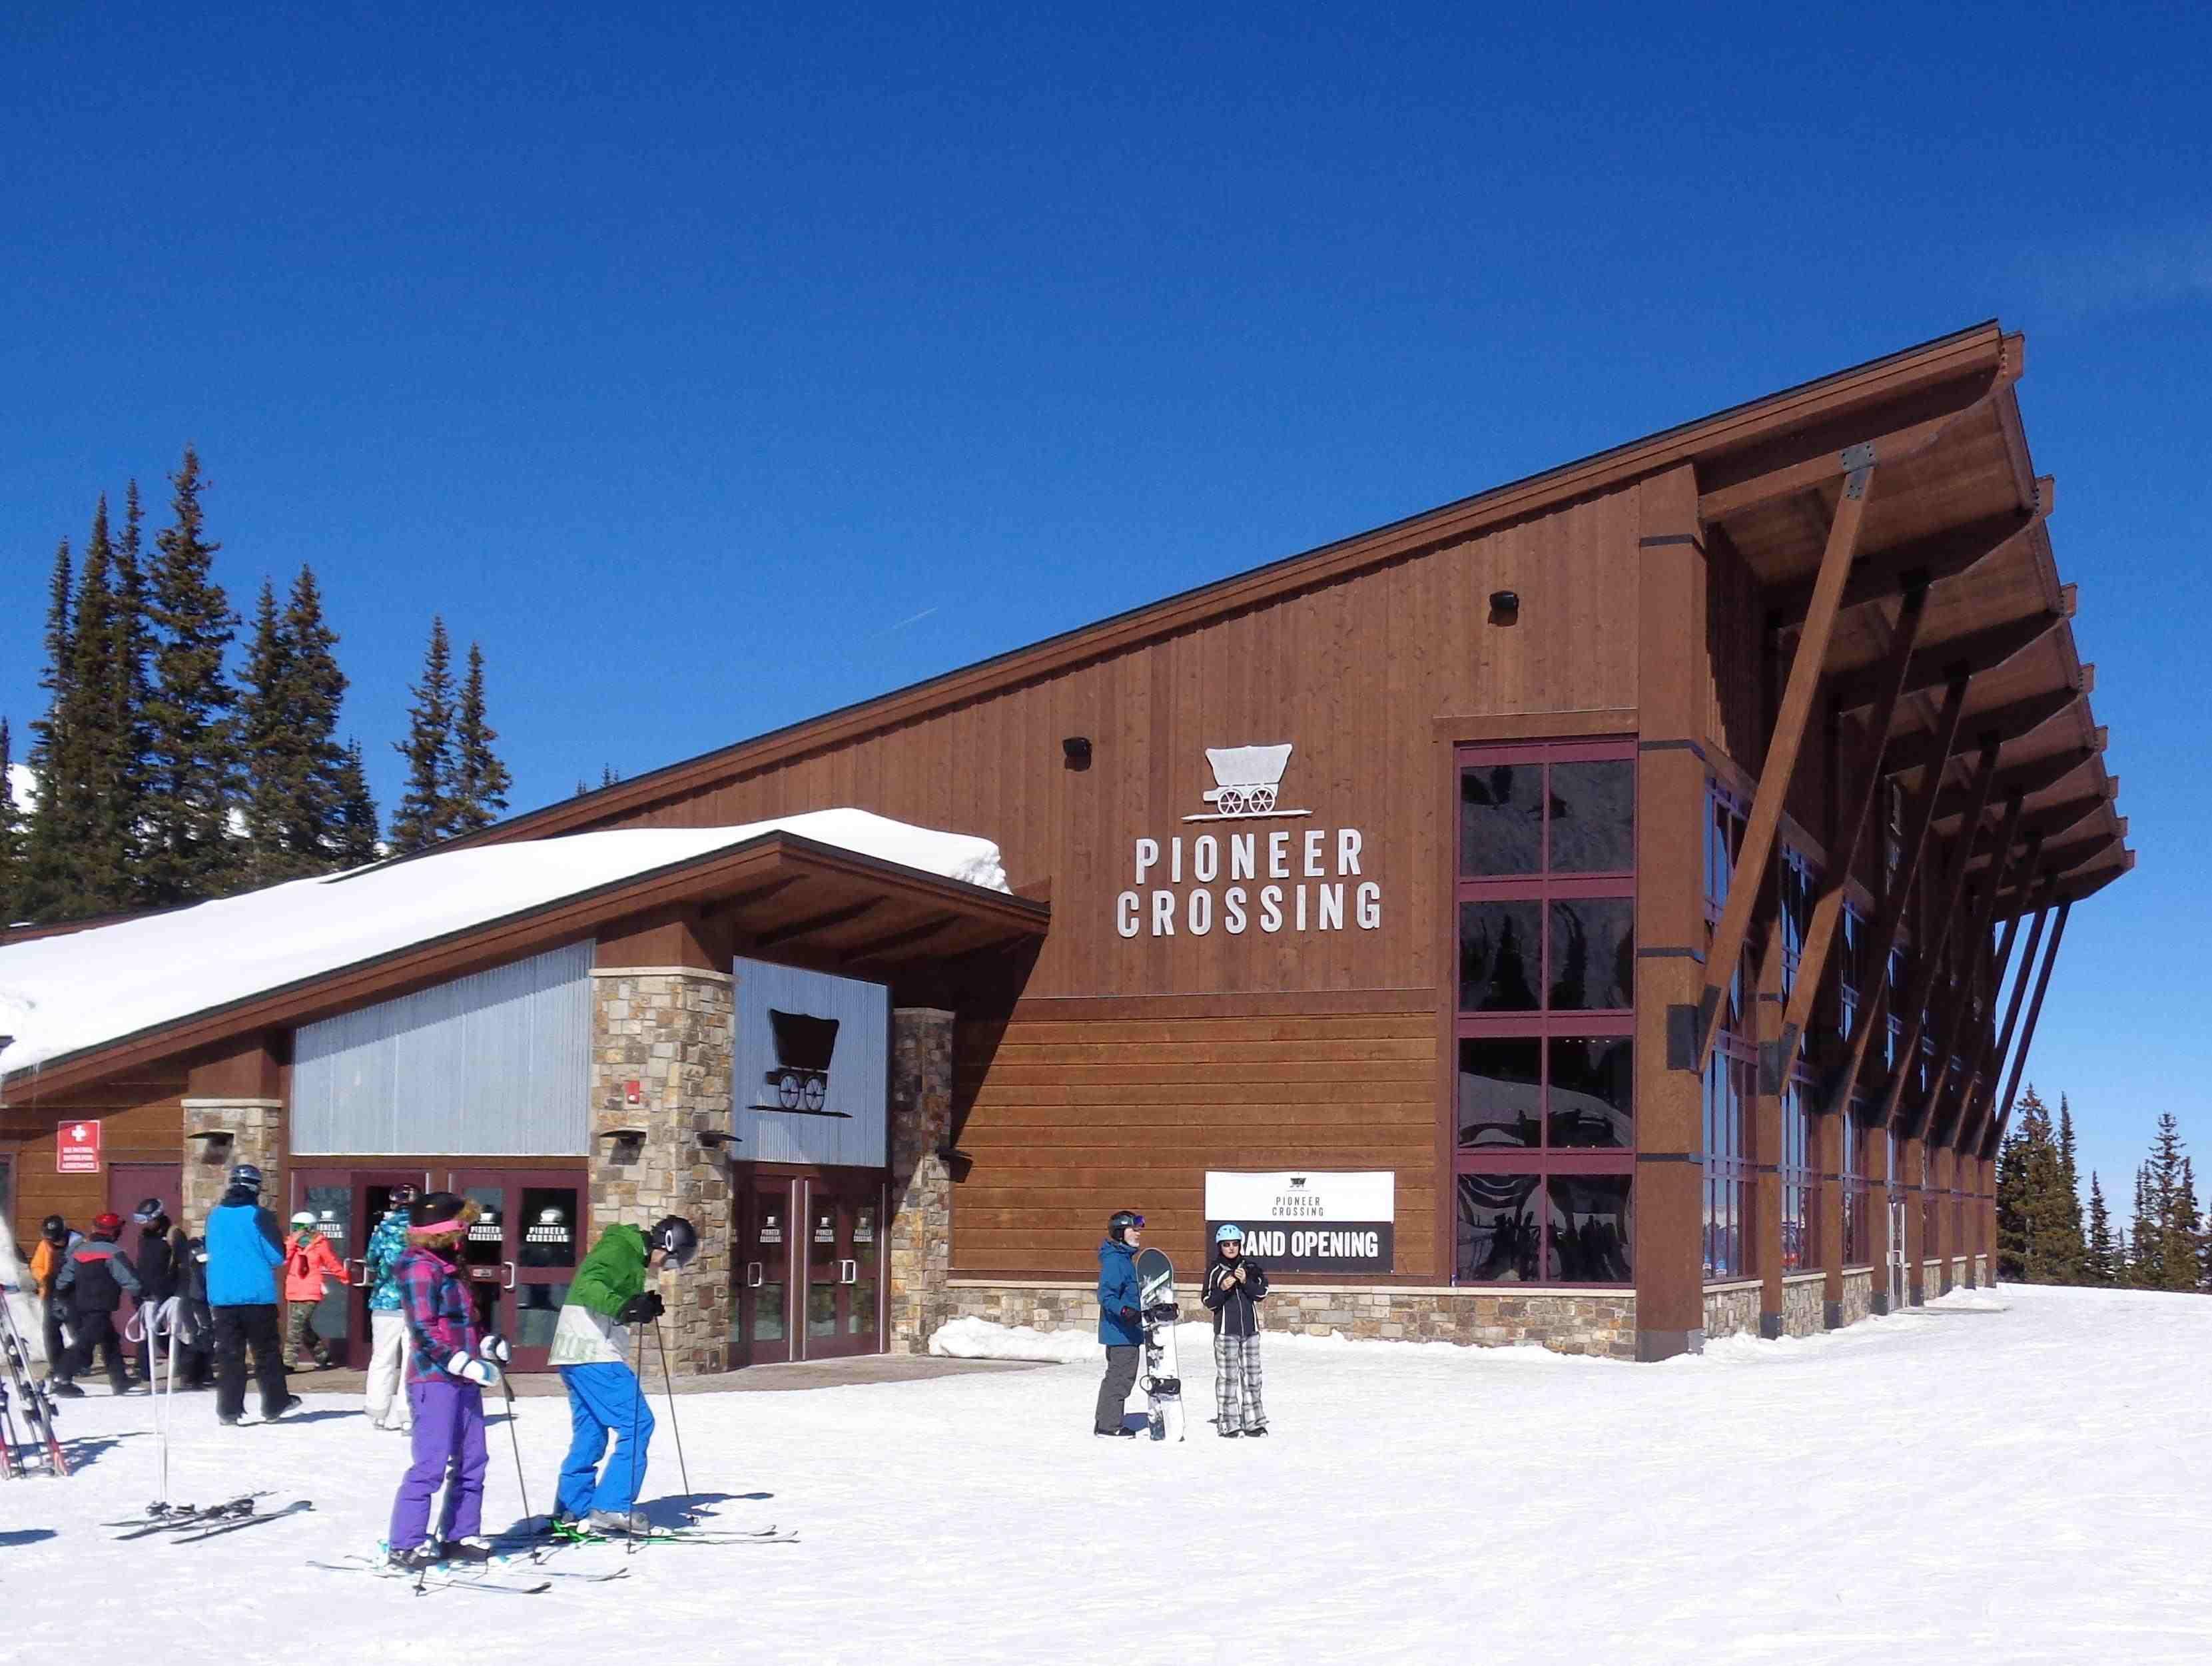 New Peak 9 Lodge